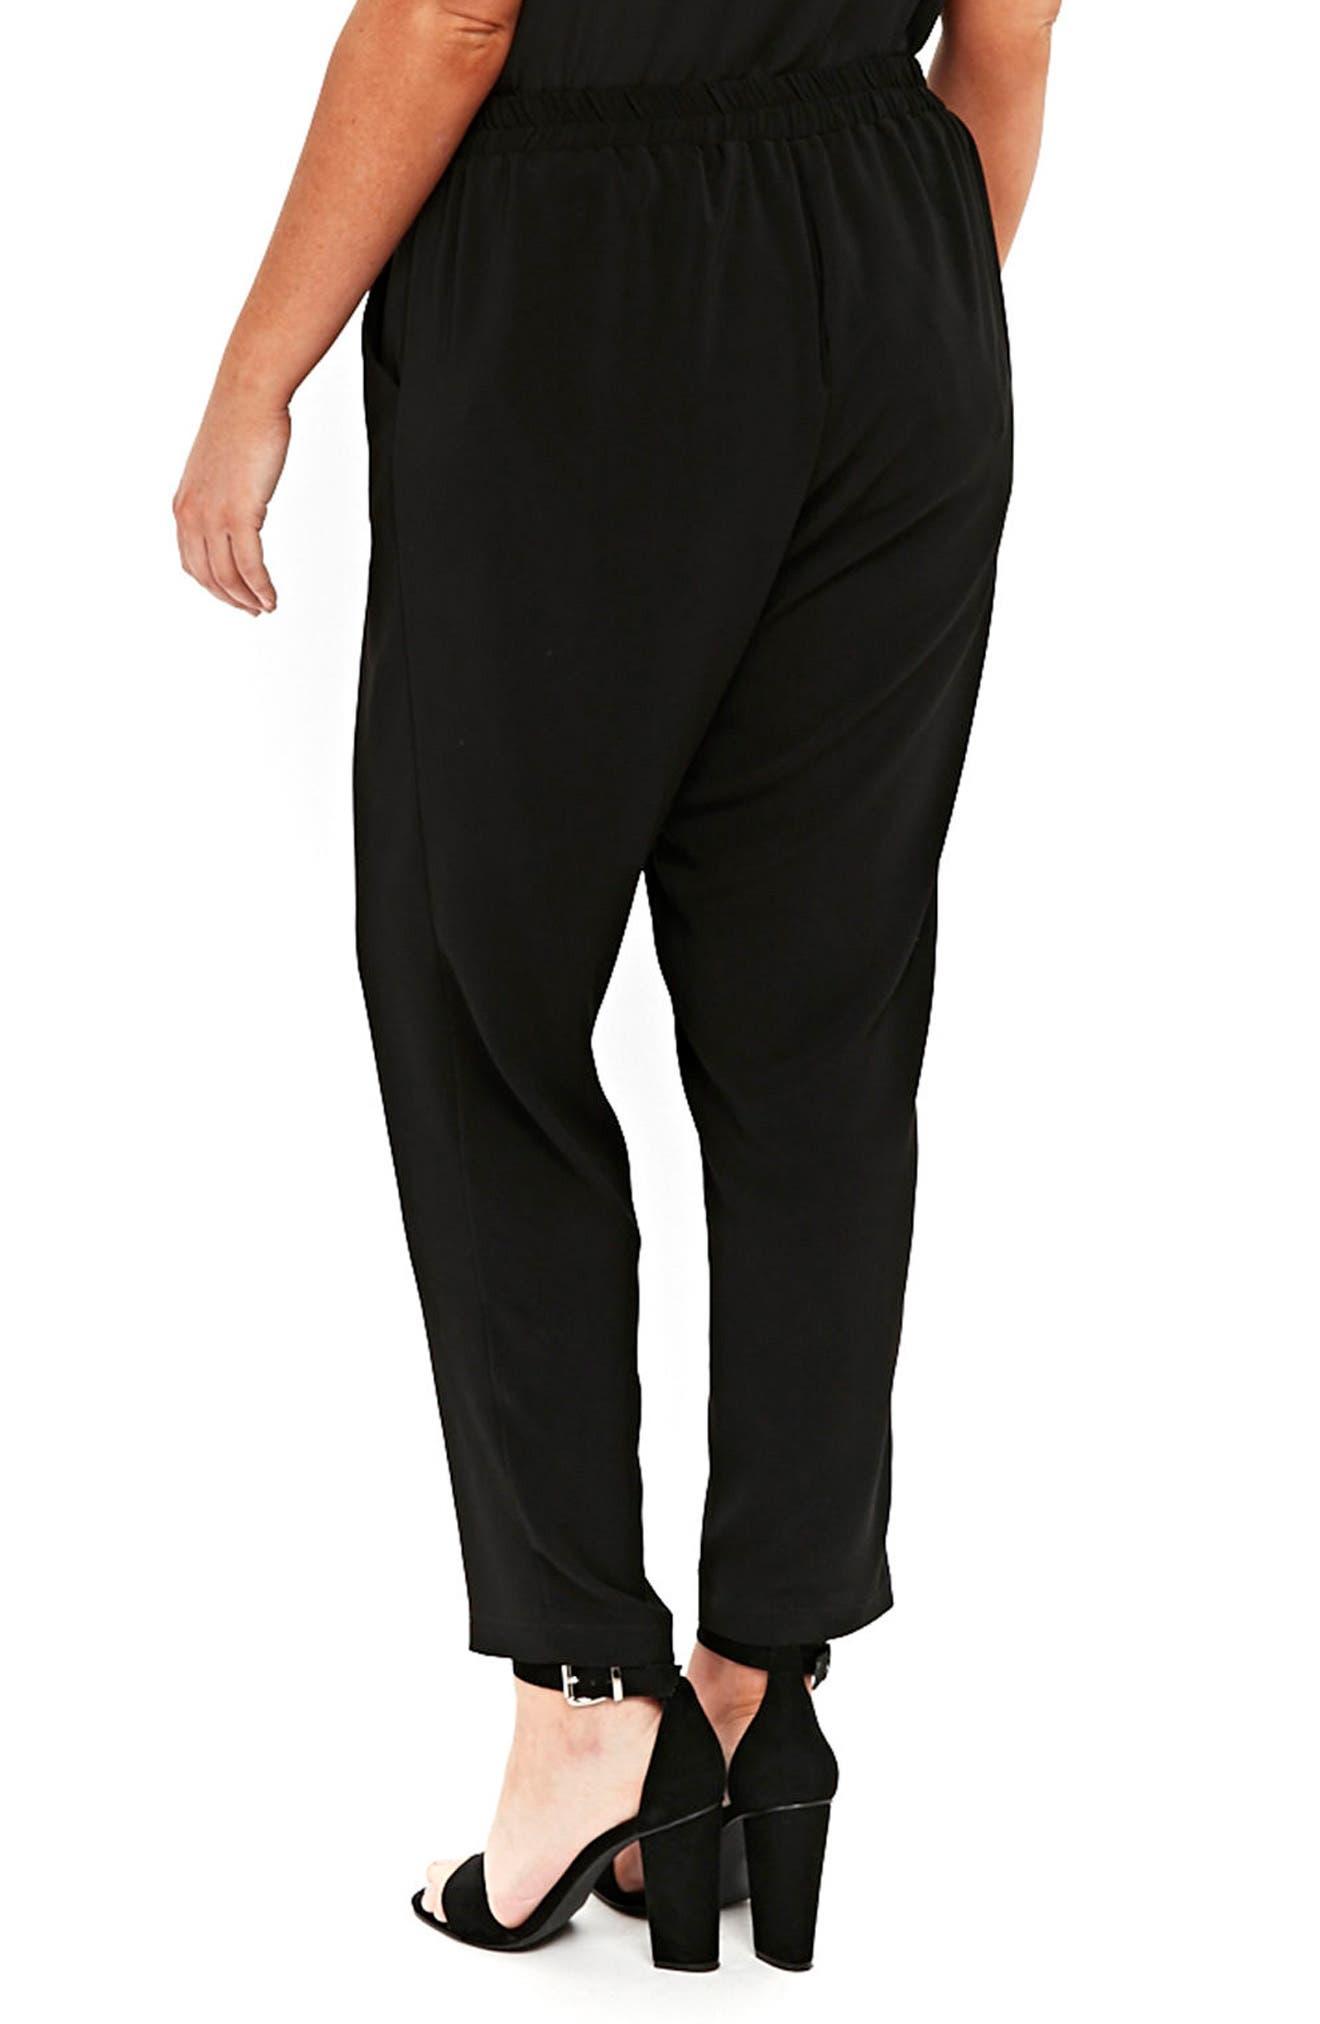 Ripple Tapered Pants,                             Alternate thumbnail 2, color,                             Black